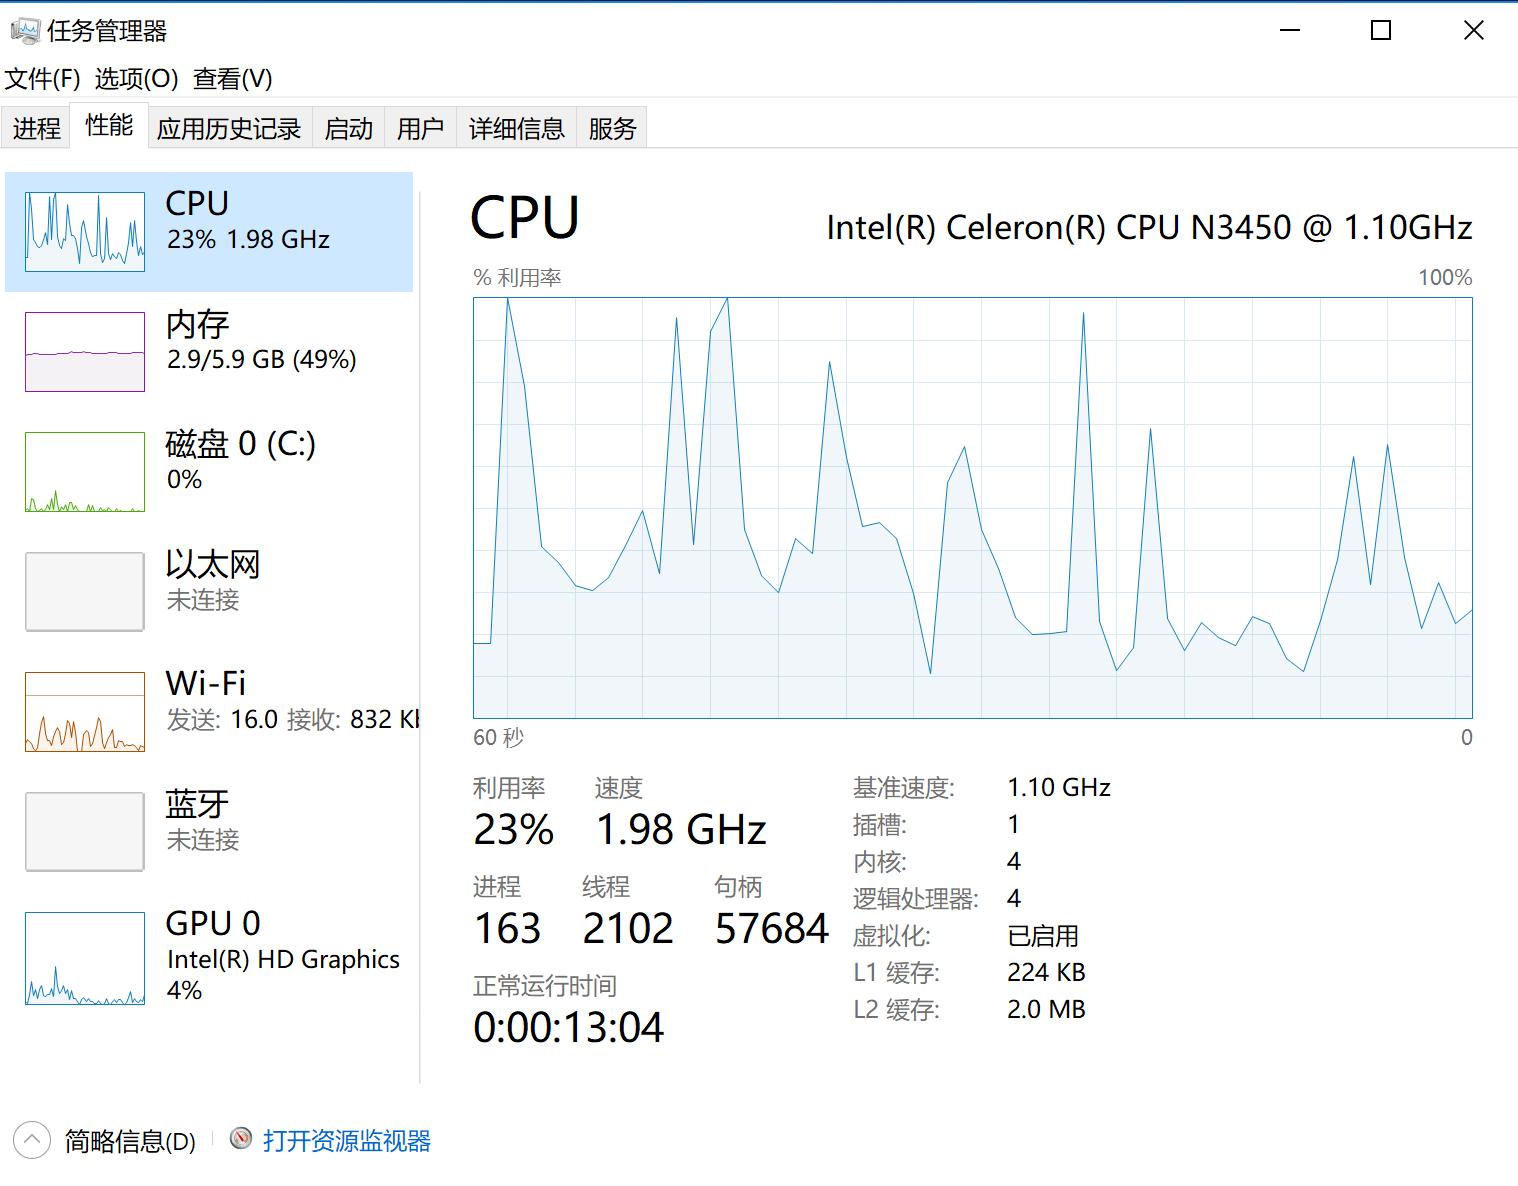 19.CPU信息